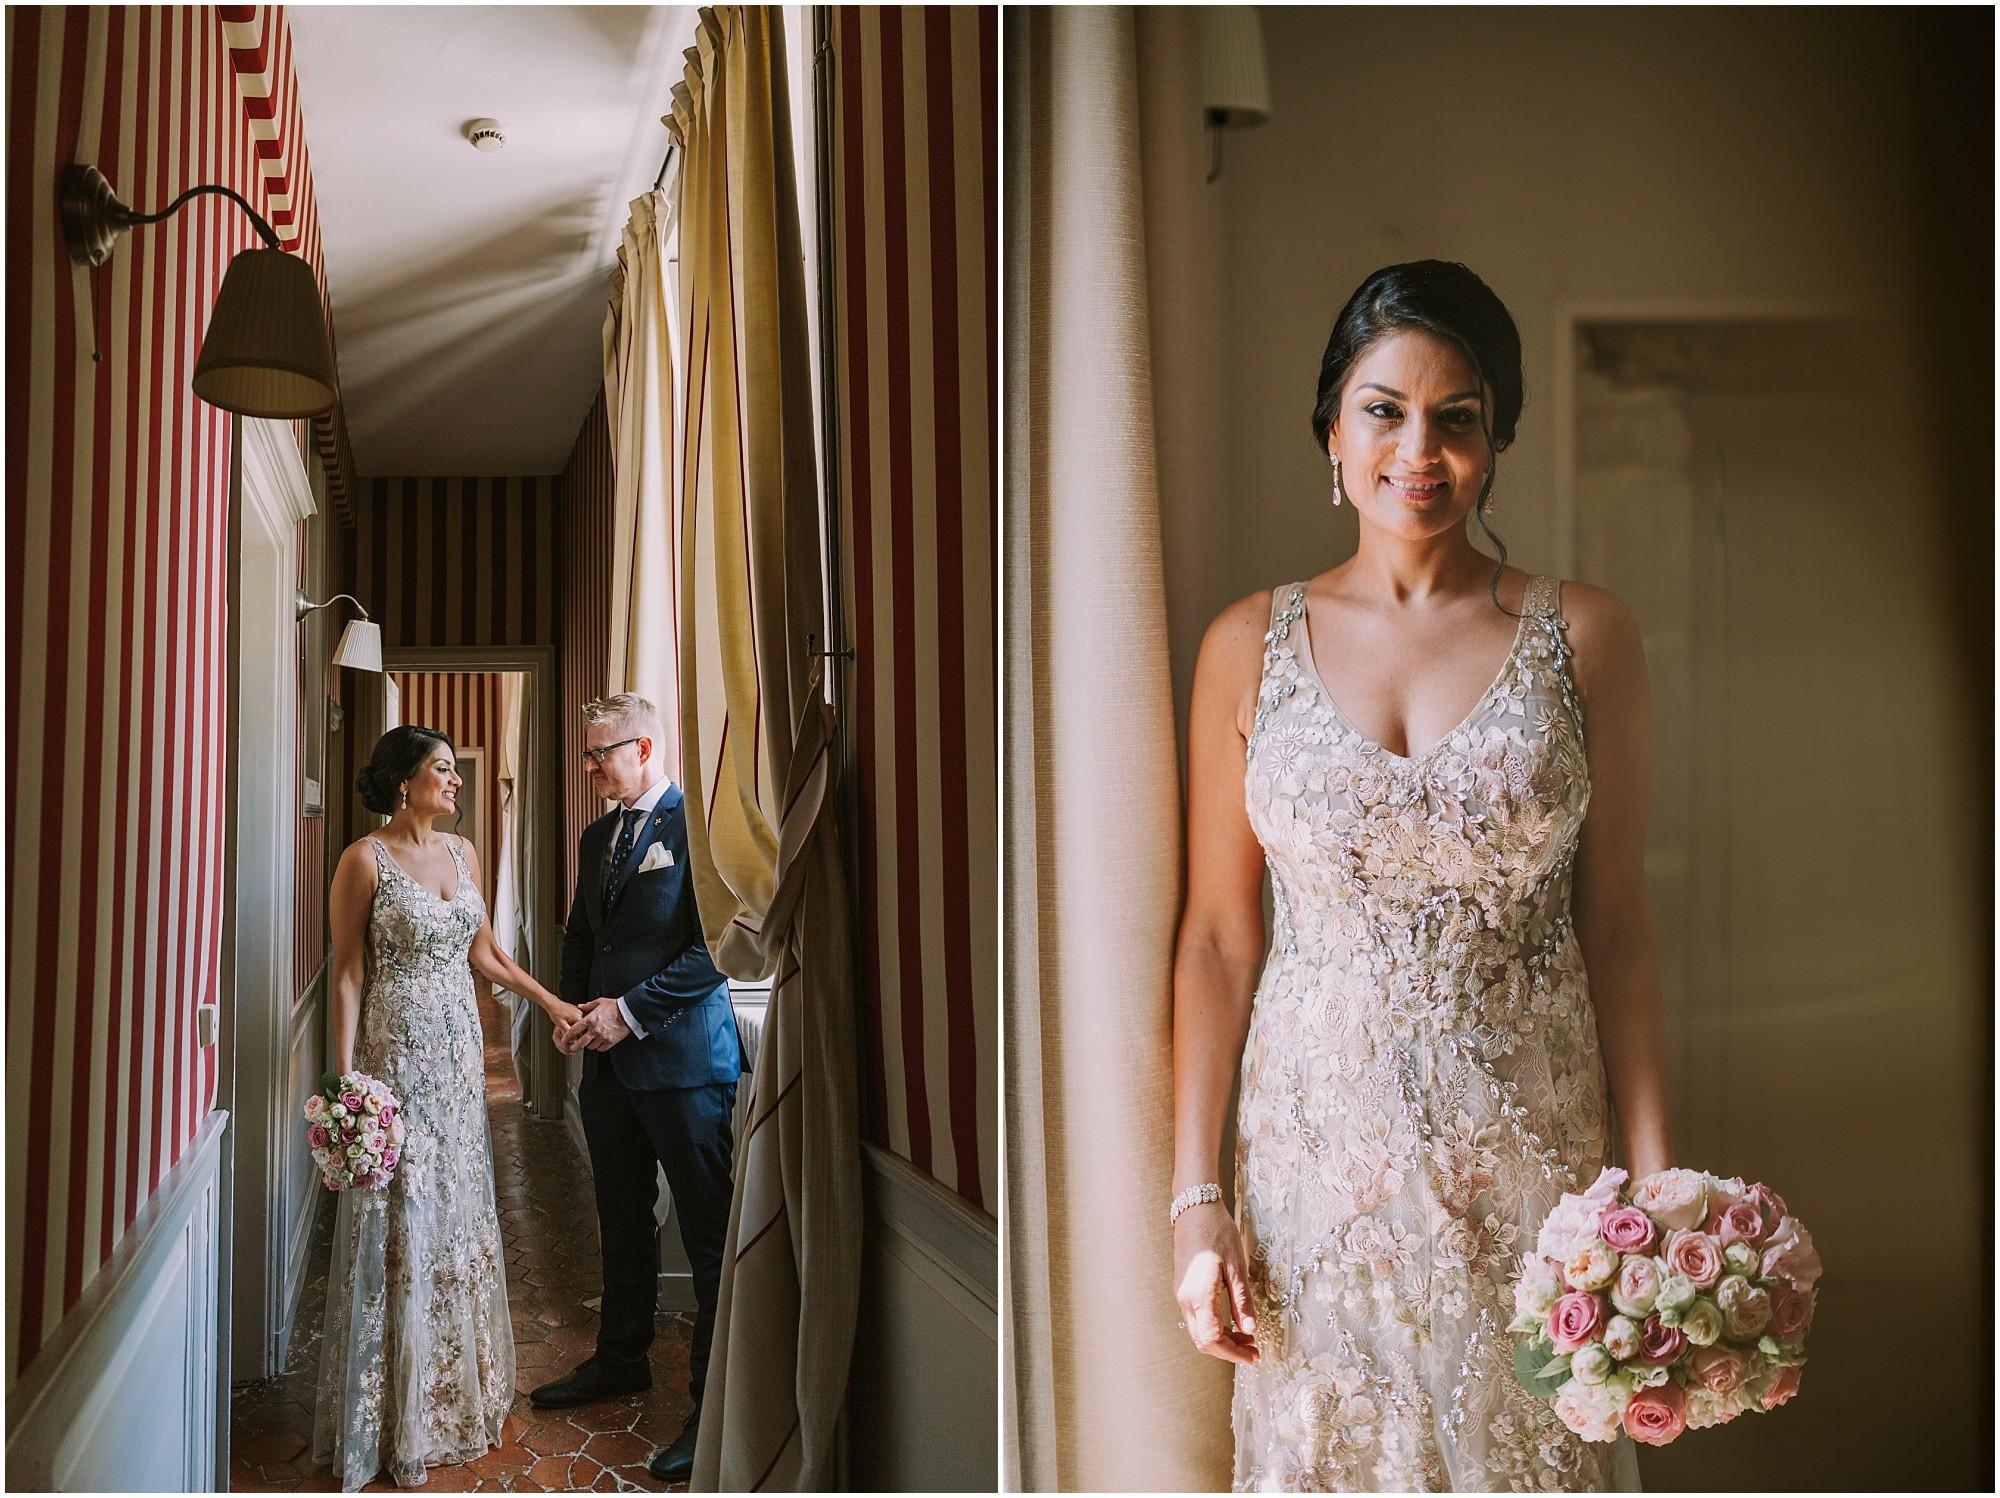 Kateryna-photos-photographer-mariage-chateau-saint-paterne-alencon-normandie-mayenne-le-mans_0023.jpg